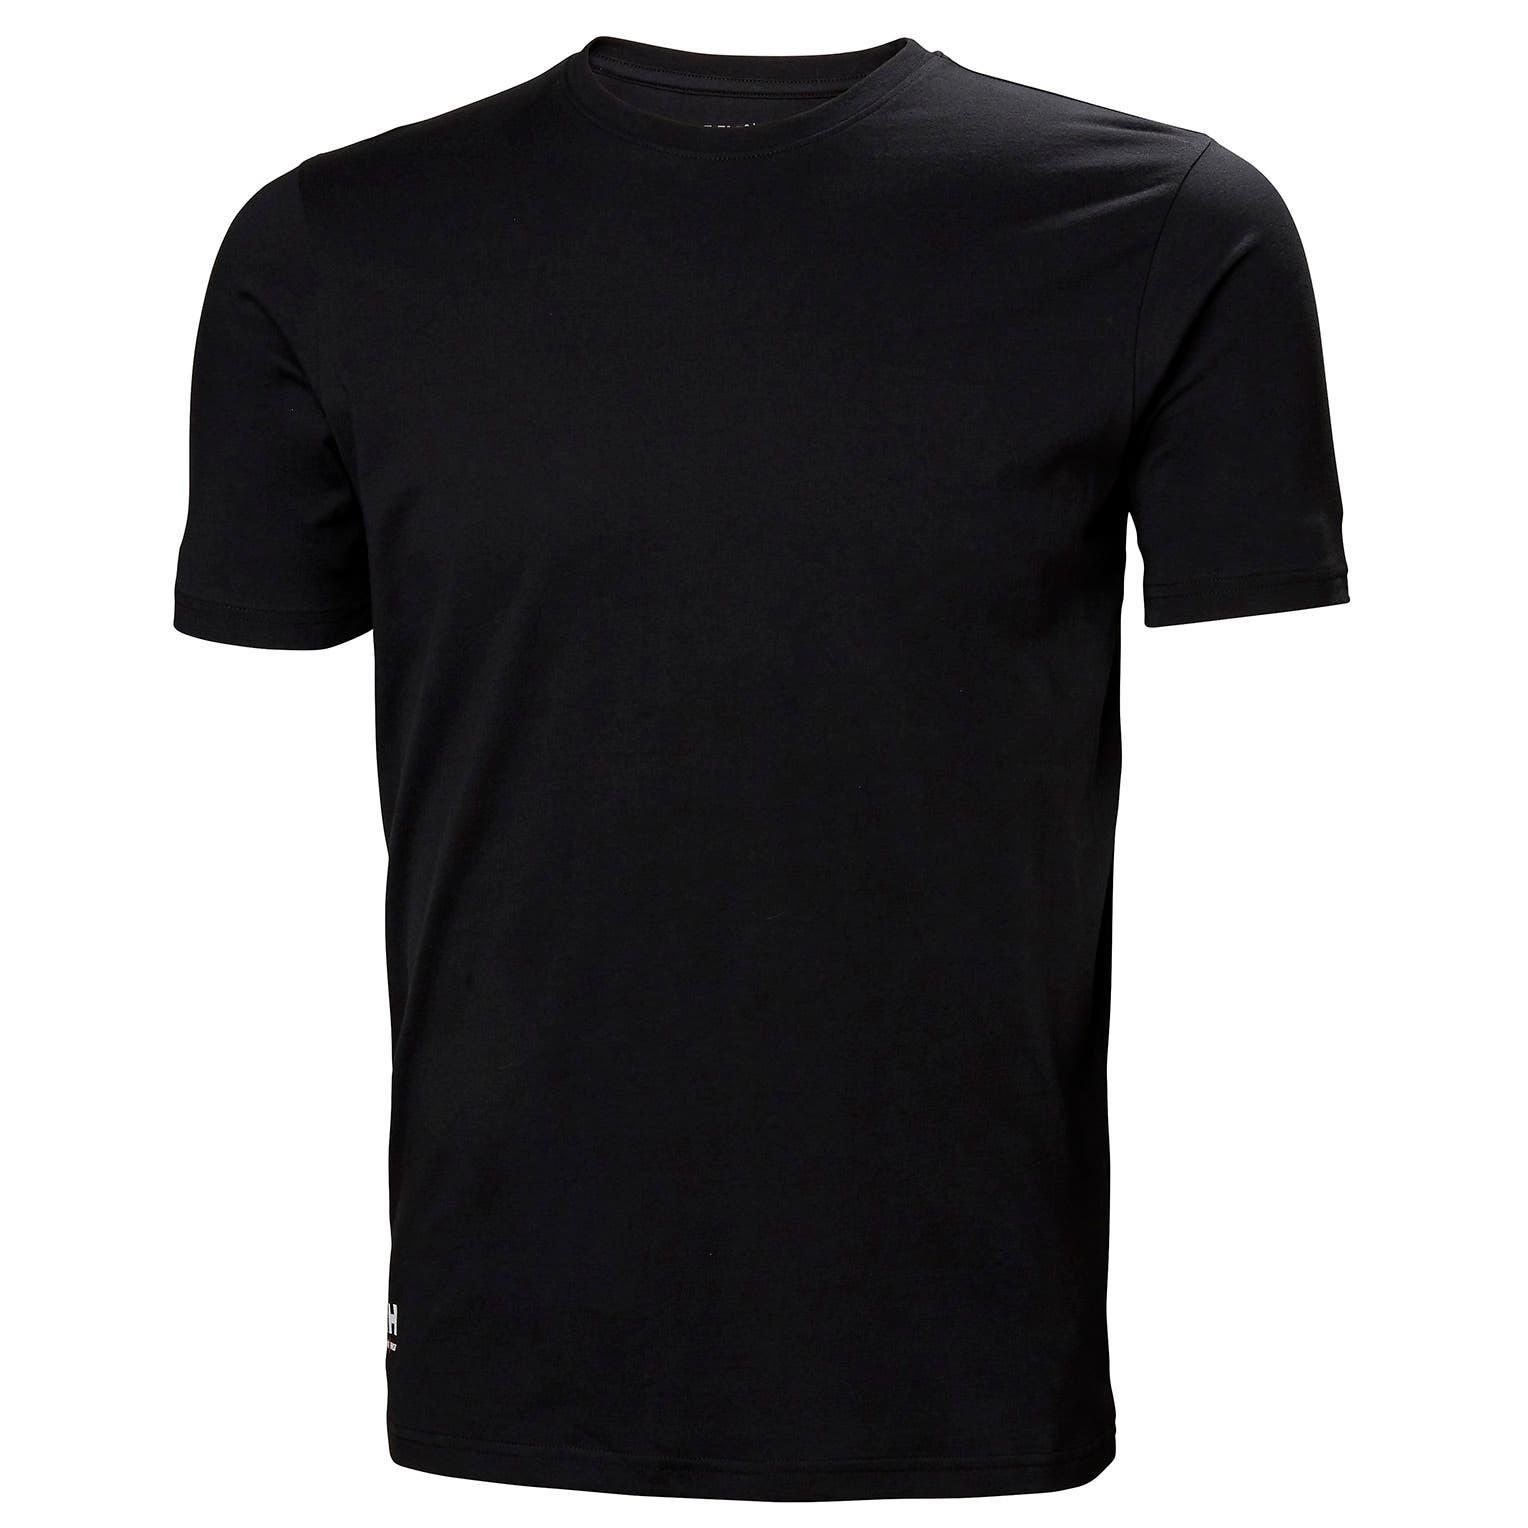 Футболка Helly Hansen Manchester T-Shirt - 79161 (Black; L)